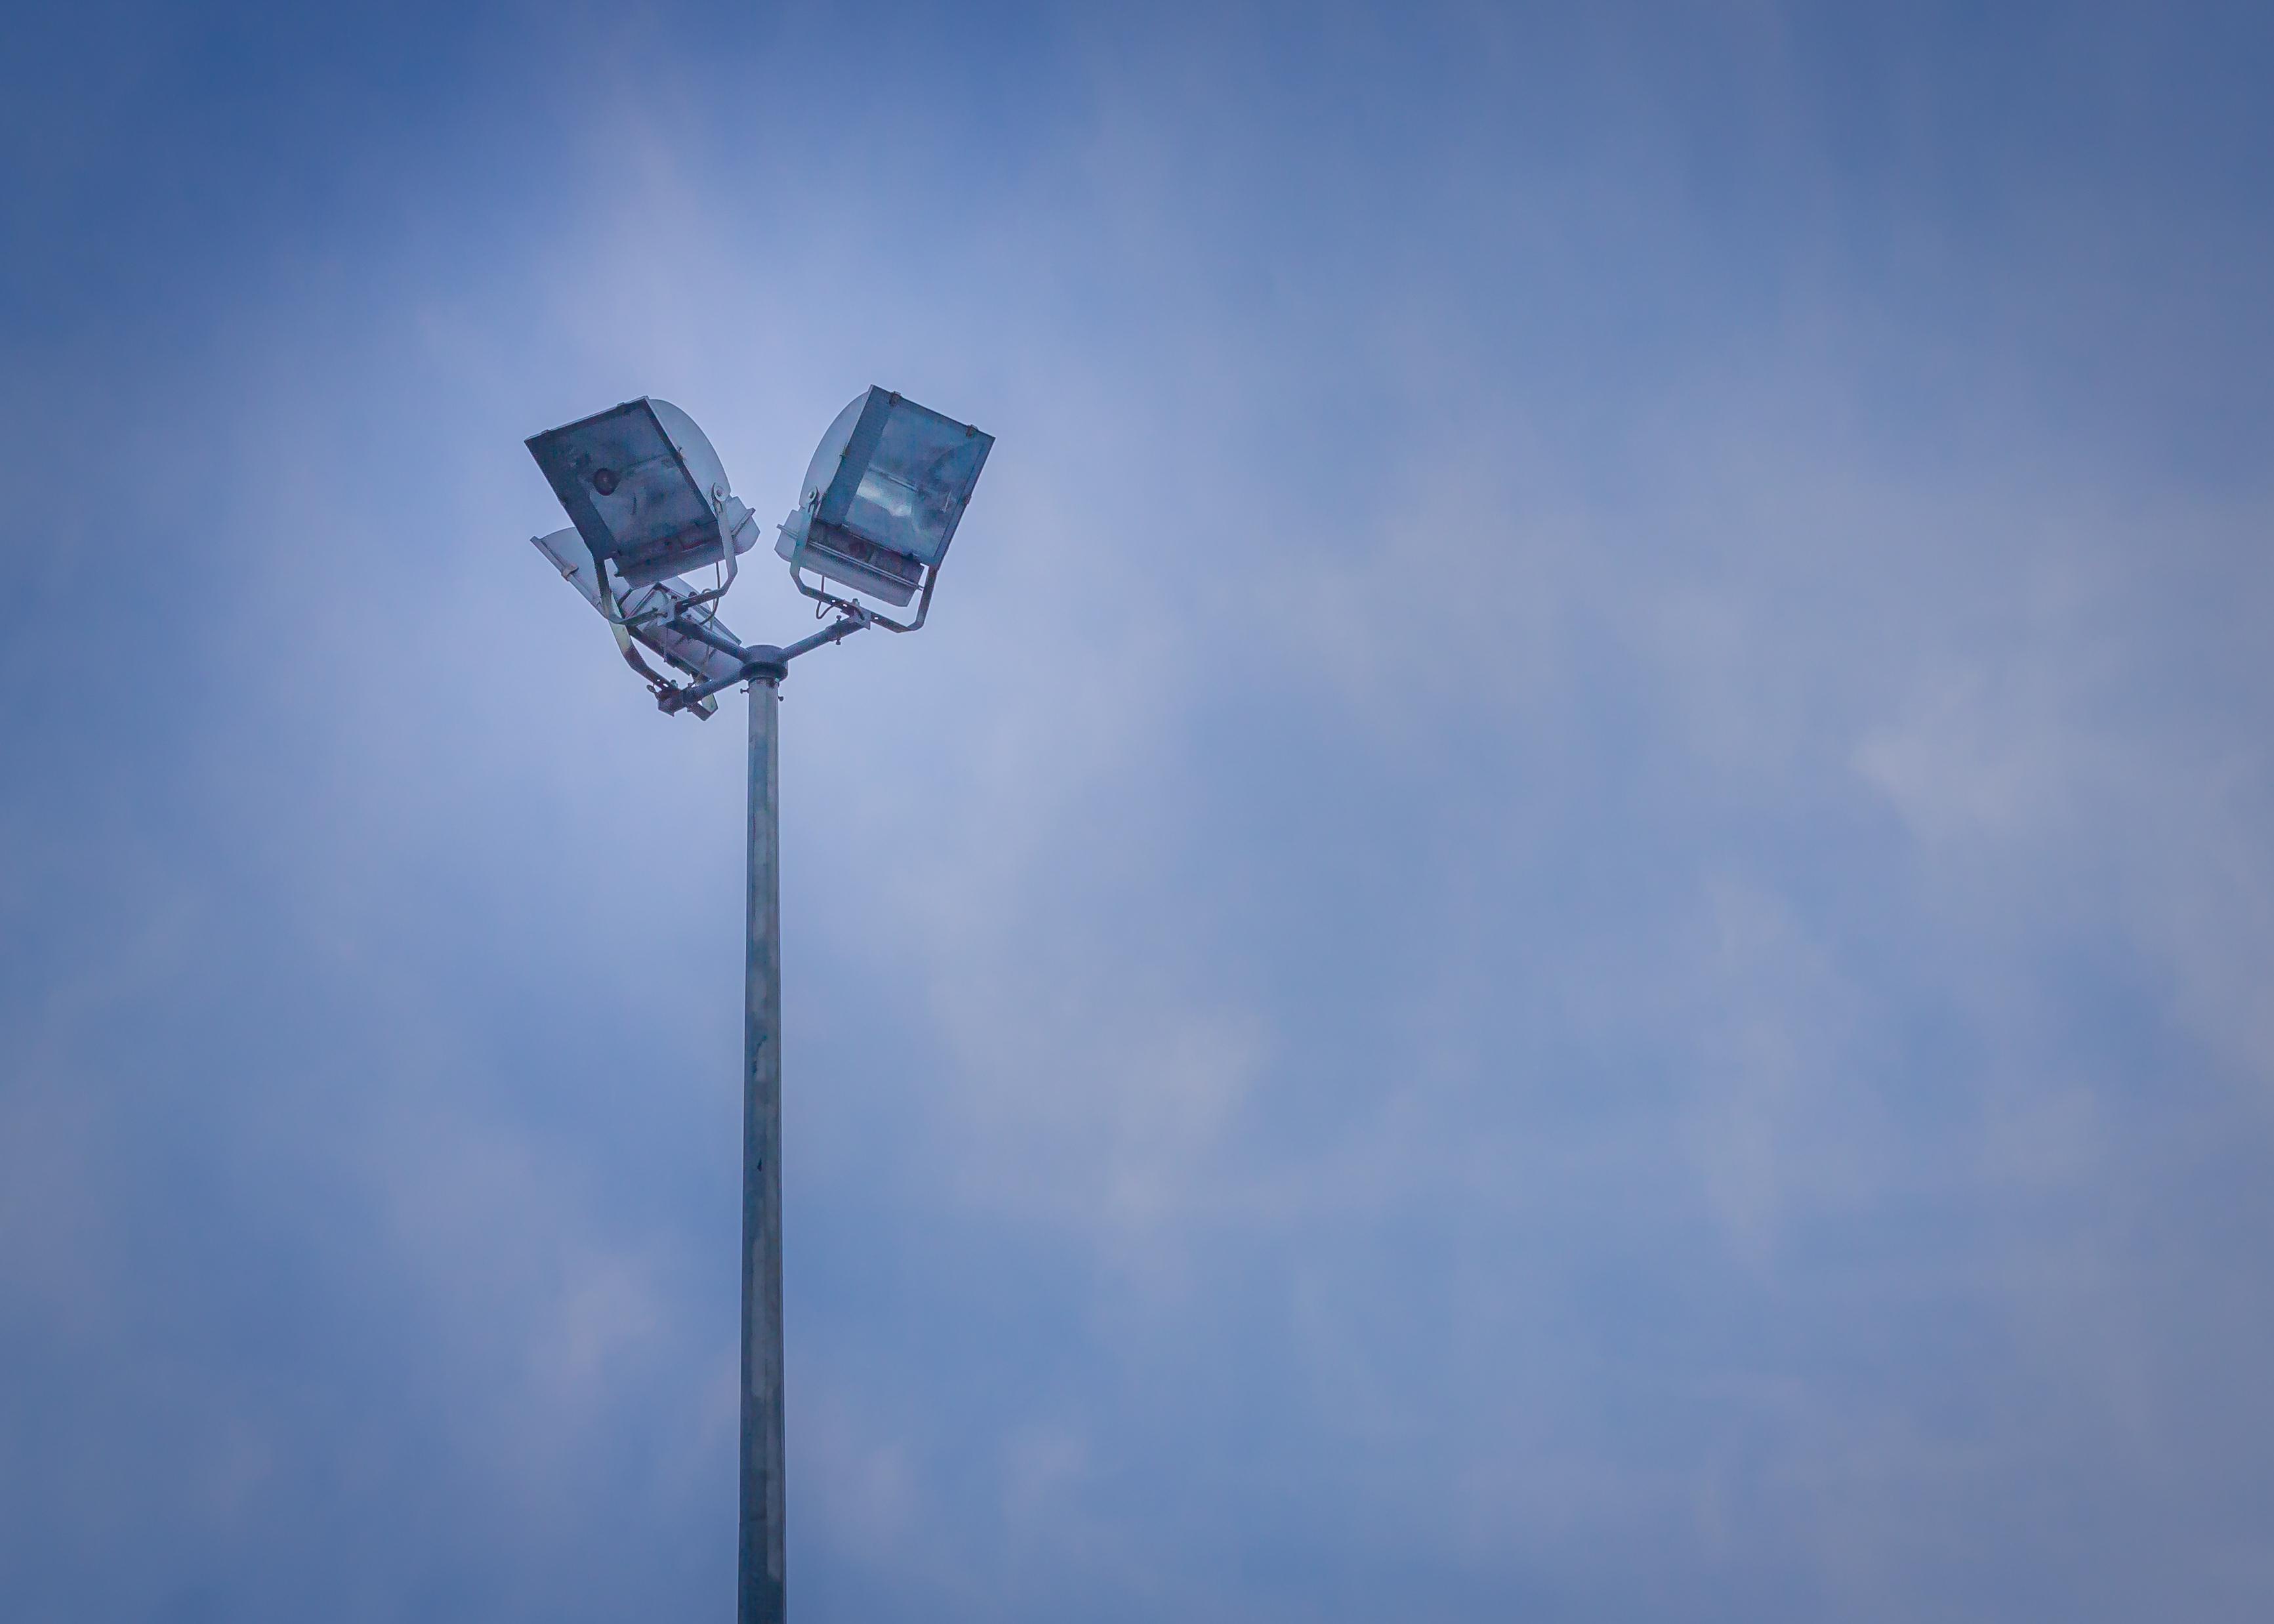 Street Lights, Bulb, Flash, Lights, Metal, HQ Photo